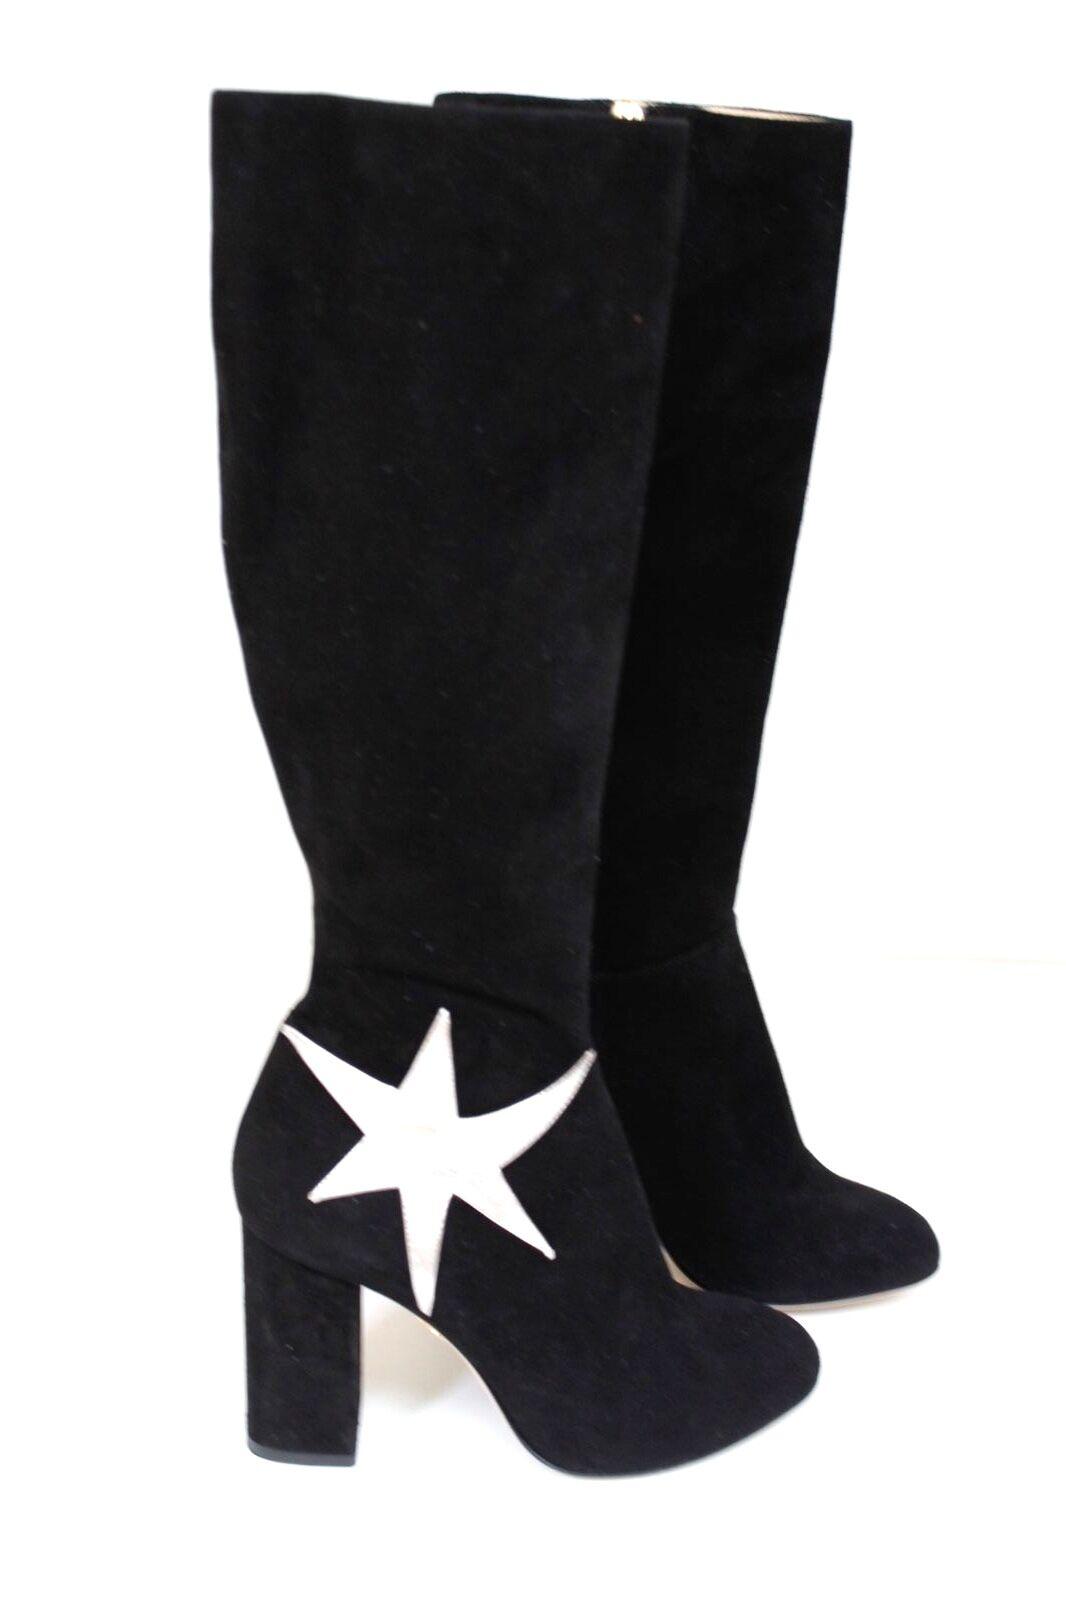 CHARLOTTE OLYMPIA Barbara metallic appliquéd schwarz suede Stiefel 36 uk 3